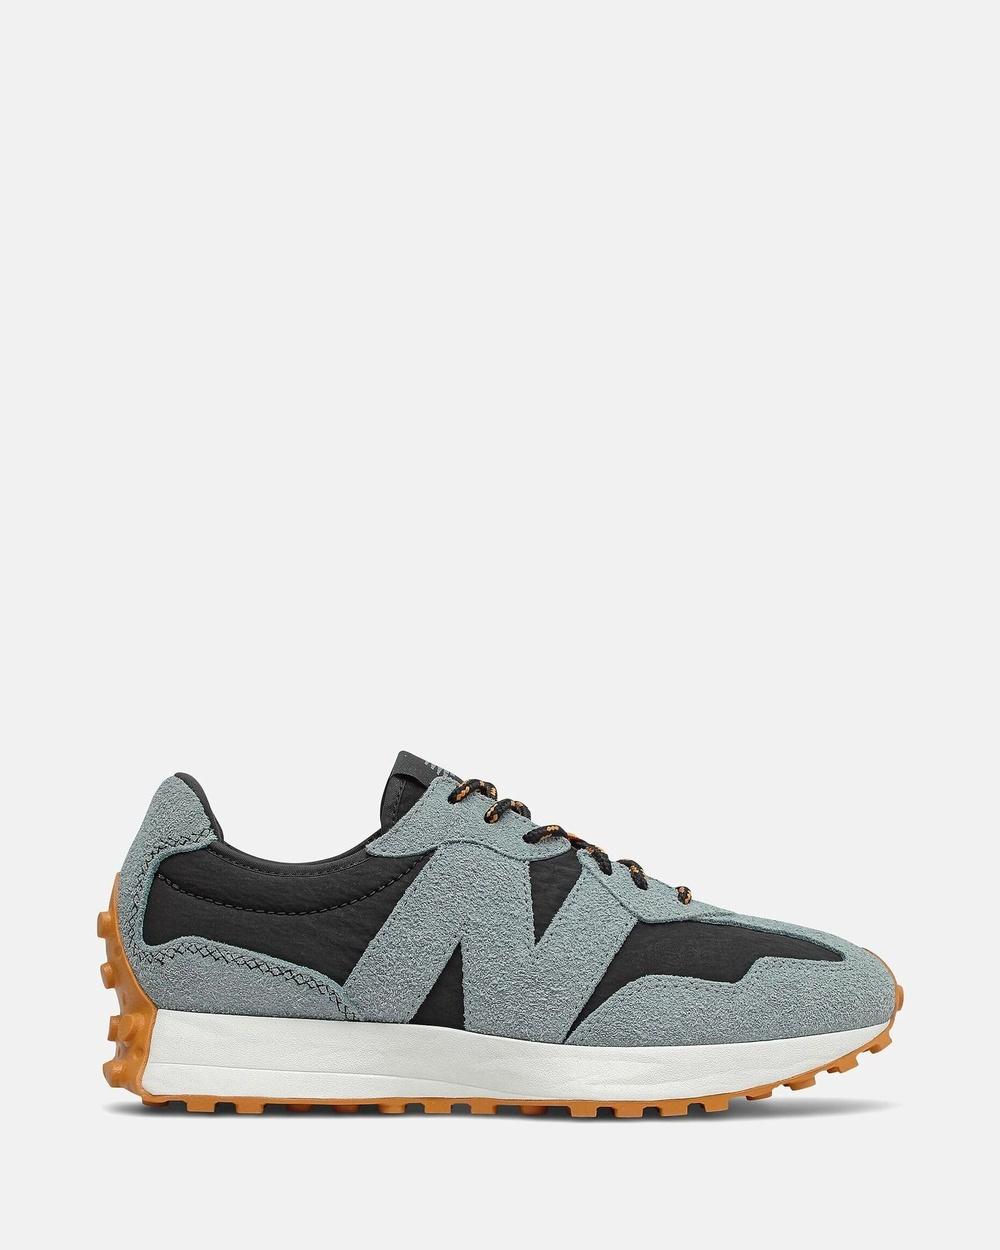 New Balance MS327V1 Men's Performance Shoes Black Australia